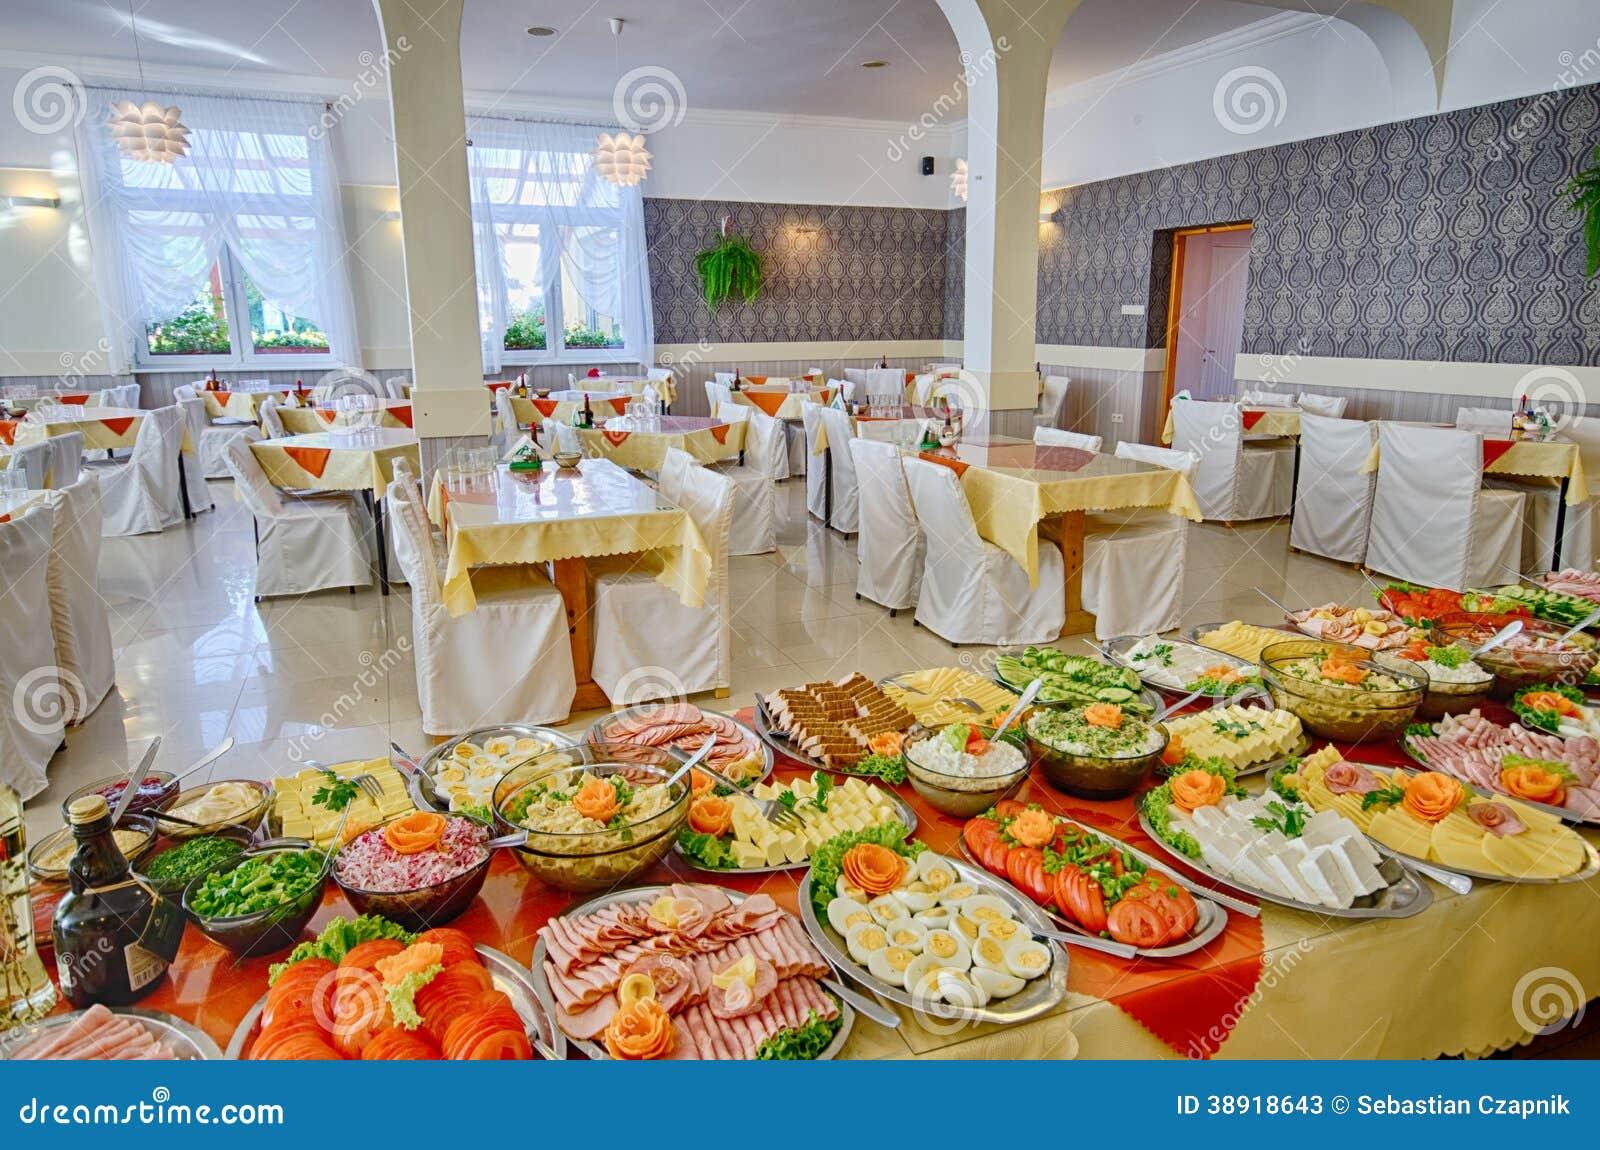 Food Buffet Stock Photo Image 38918643